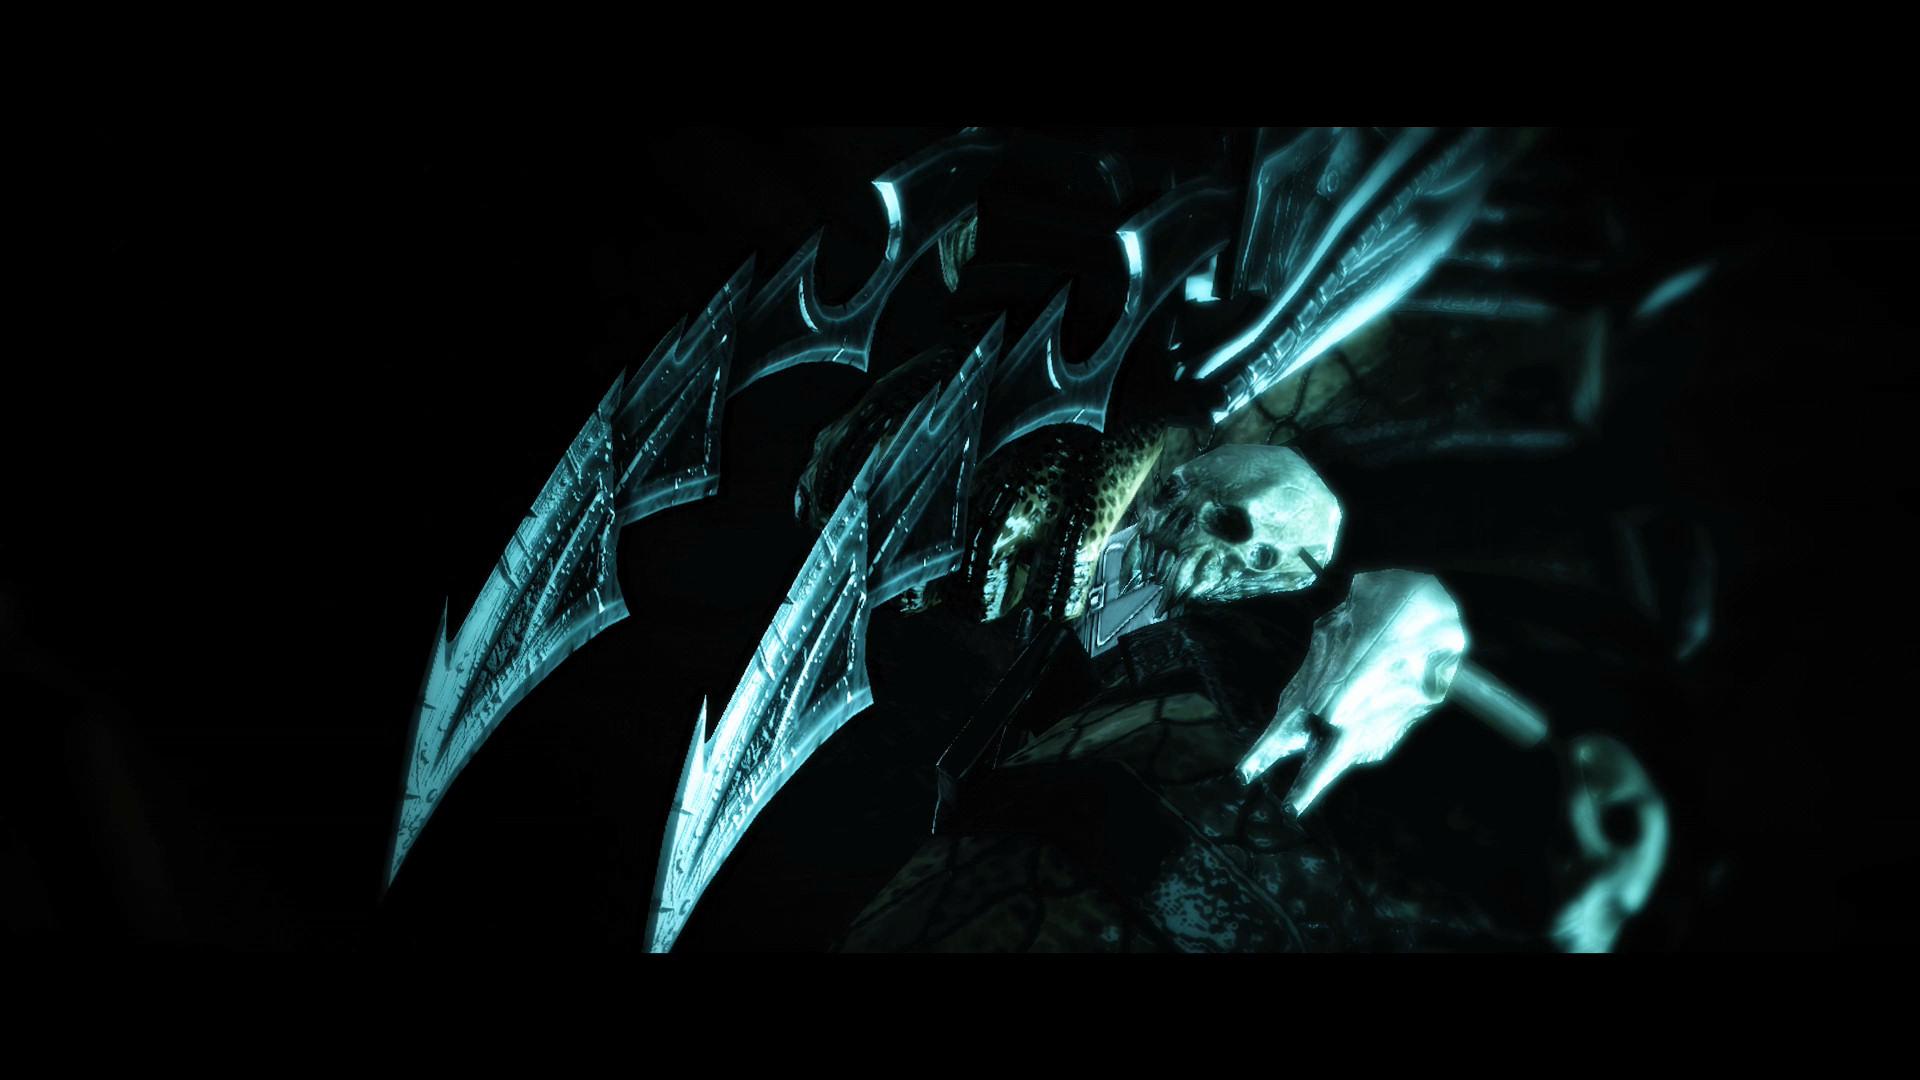 Predators Blades Wallpapers Predators Blades Myspace Backgrounds 1920x1080